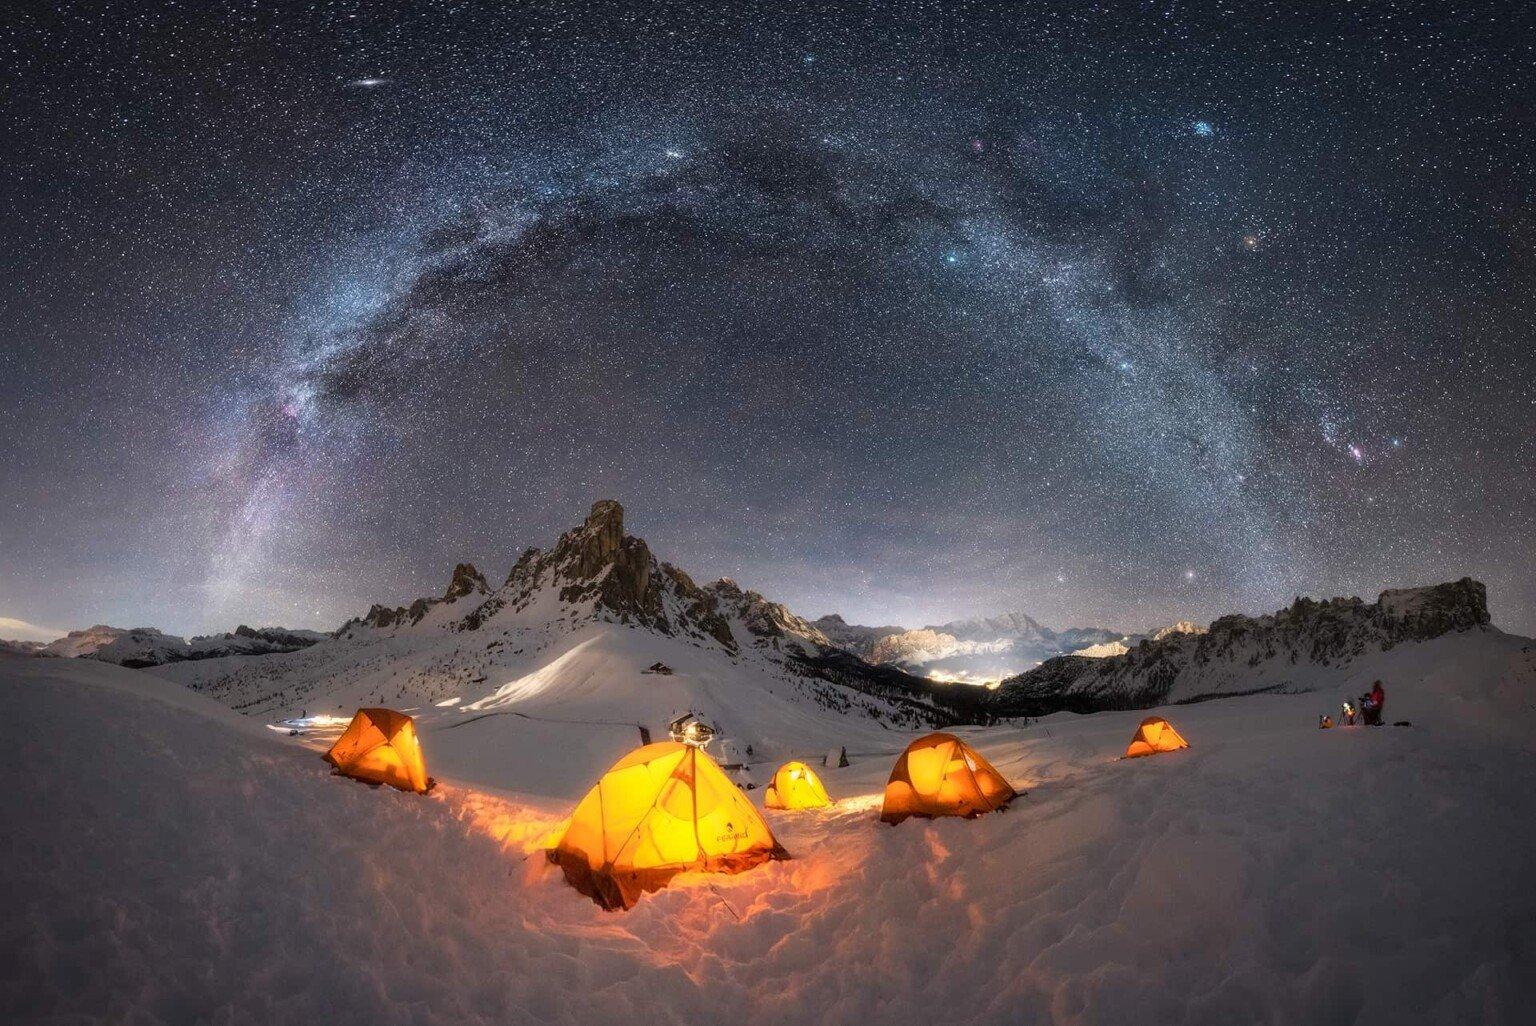 Winter-Milky-Way-photographs-Dolomites-1536×1026